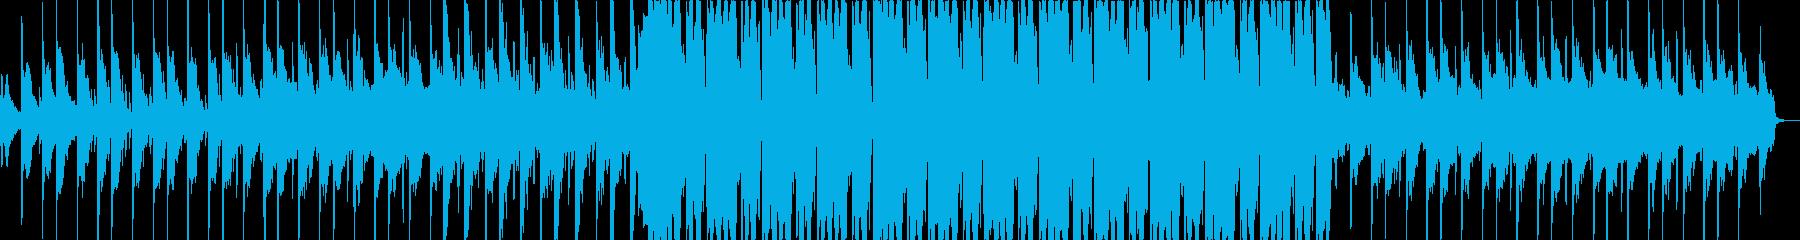 FutureBass1、洋楽、爽快、夏bの再生済みの波形